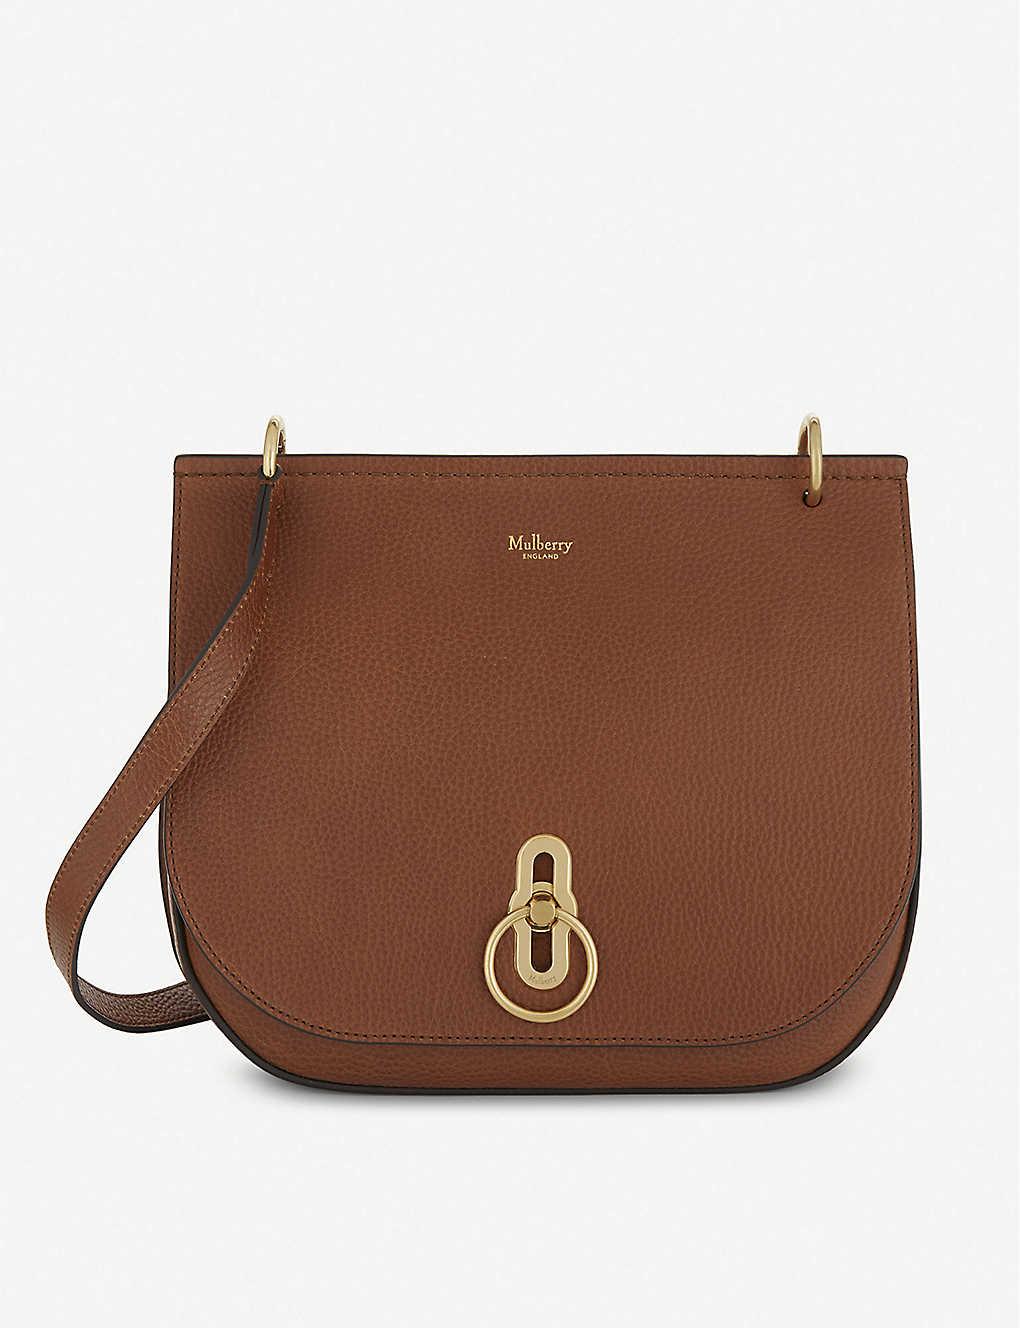 9abff895b64f MULBERRY - Amberley grained-leather satchel | Selfridges.com